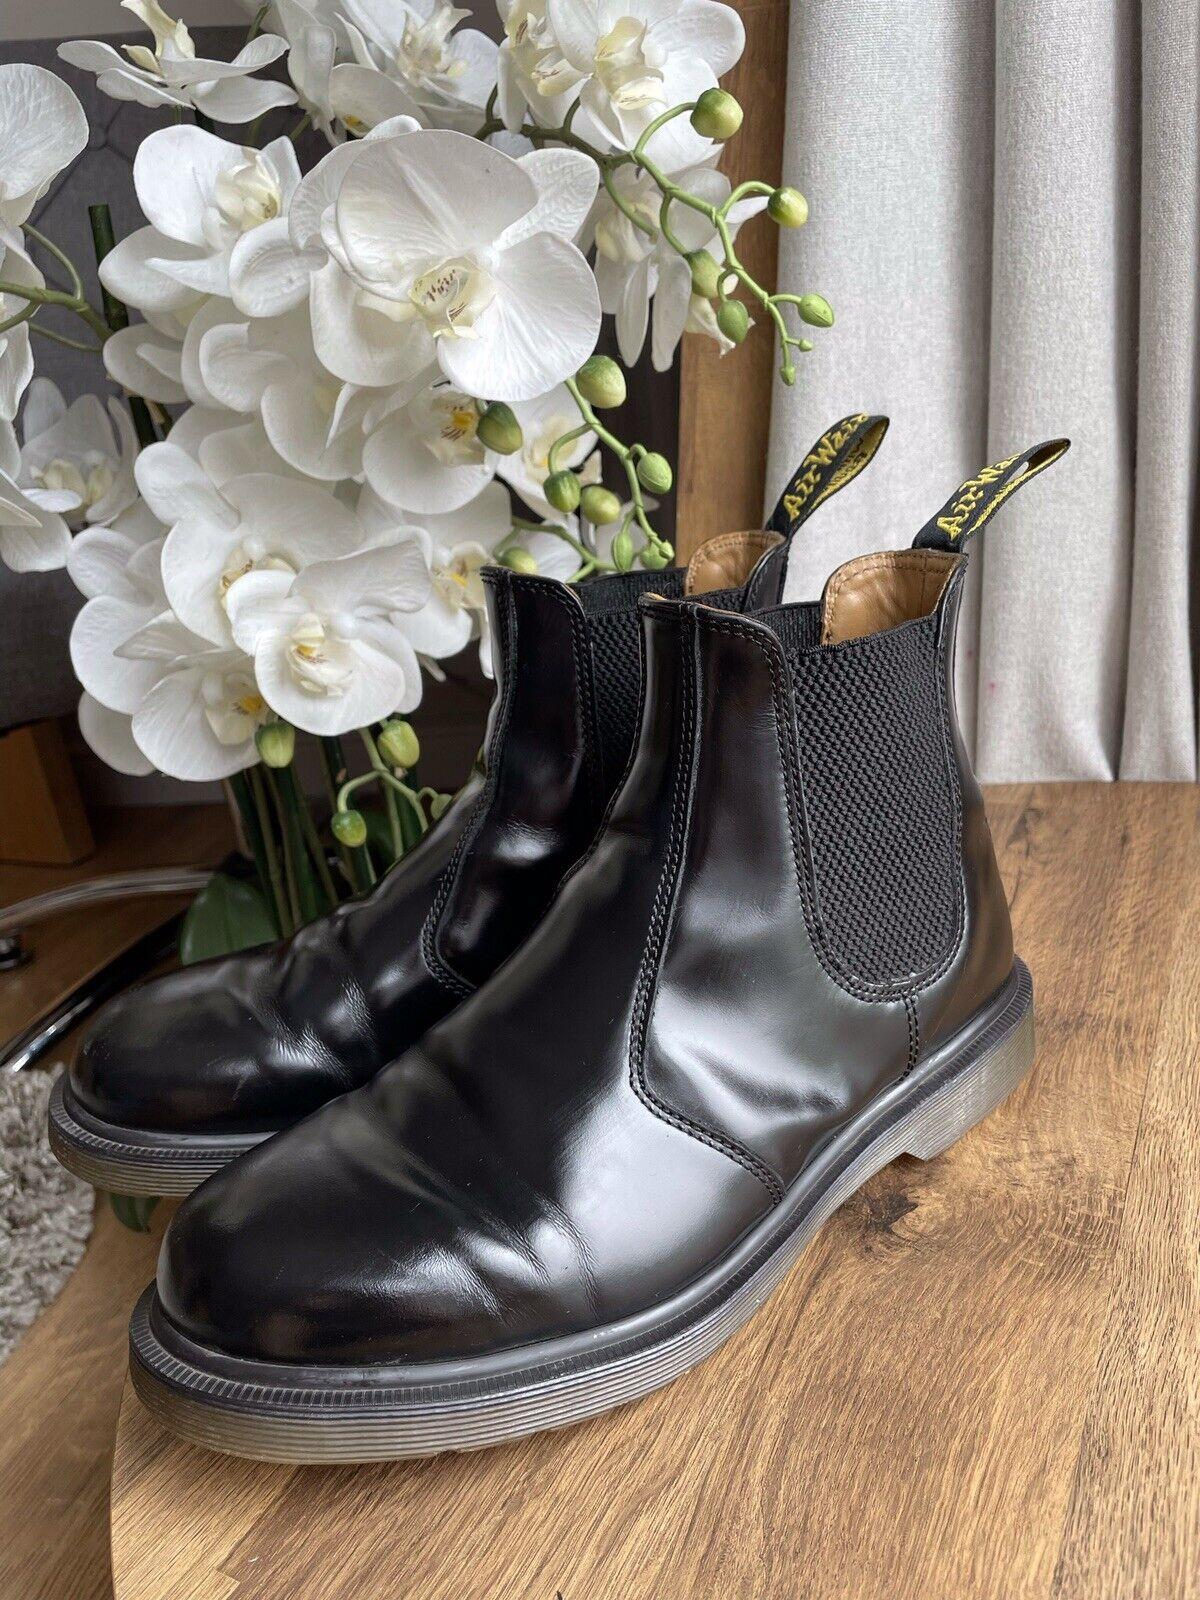 Dr Martens Unisex 2976 Chelsea Black Smooth Leather Boots Size UK 8 EU 42